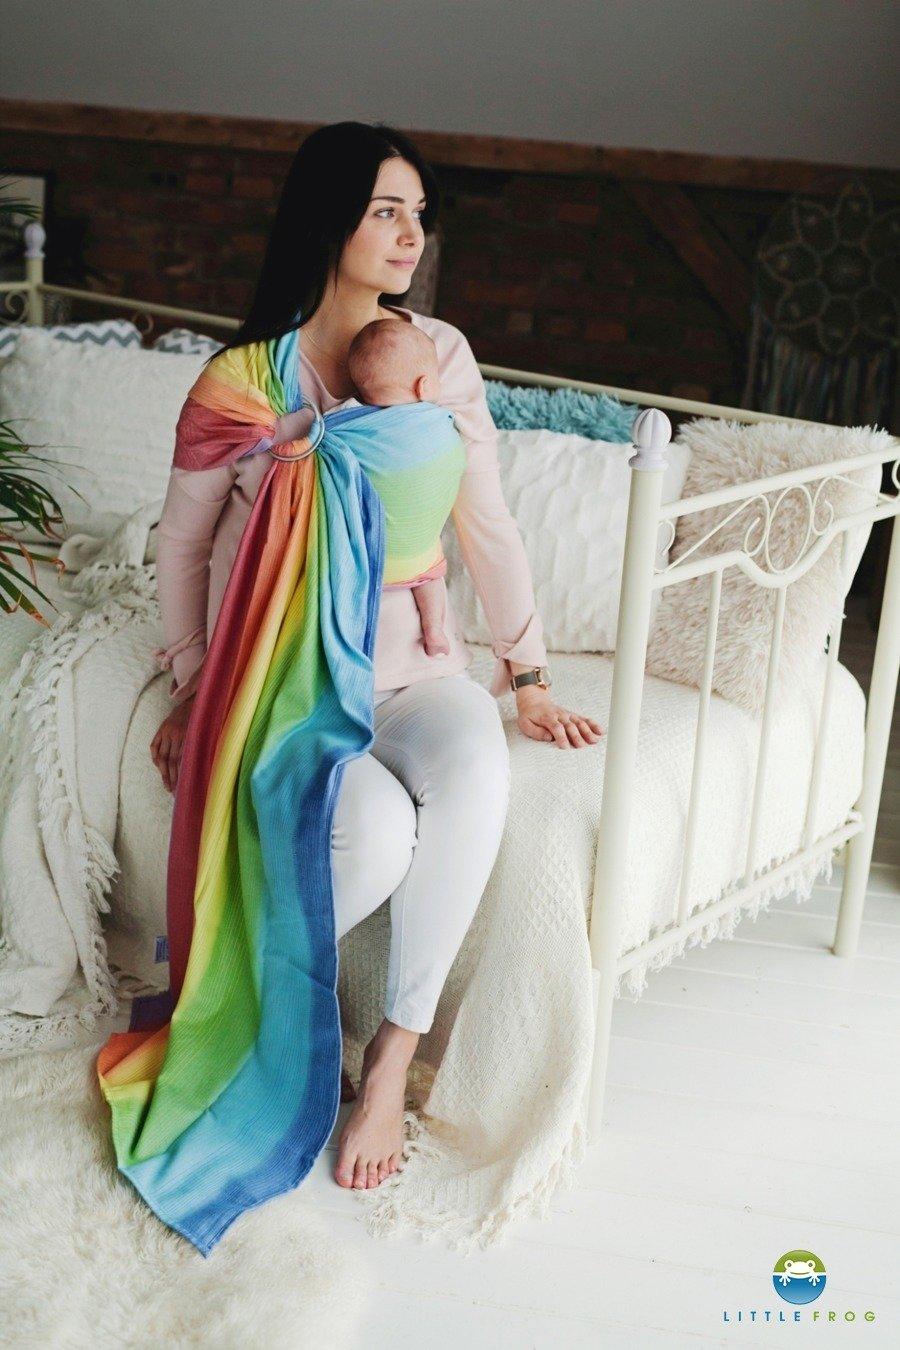 Rainbow Aura mehrfarbig Gr/ö/ße S Little Frog 6777 Ring Sling 260 g